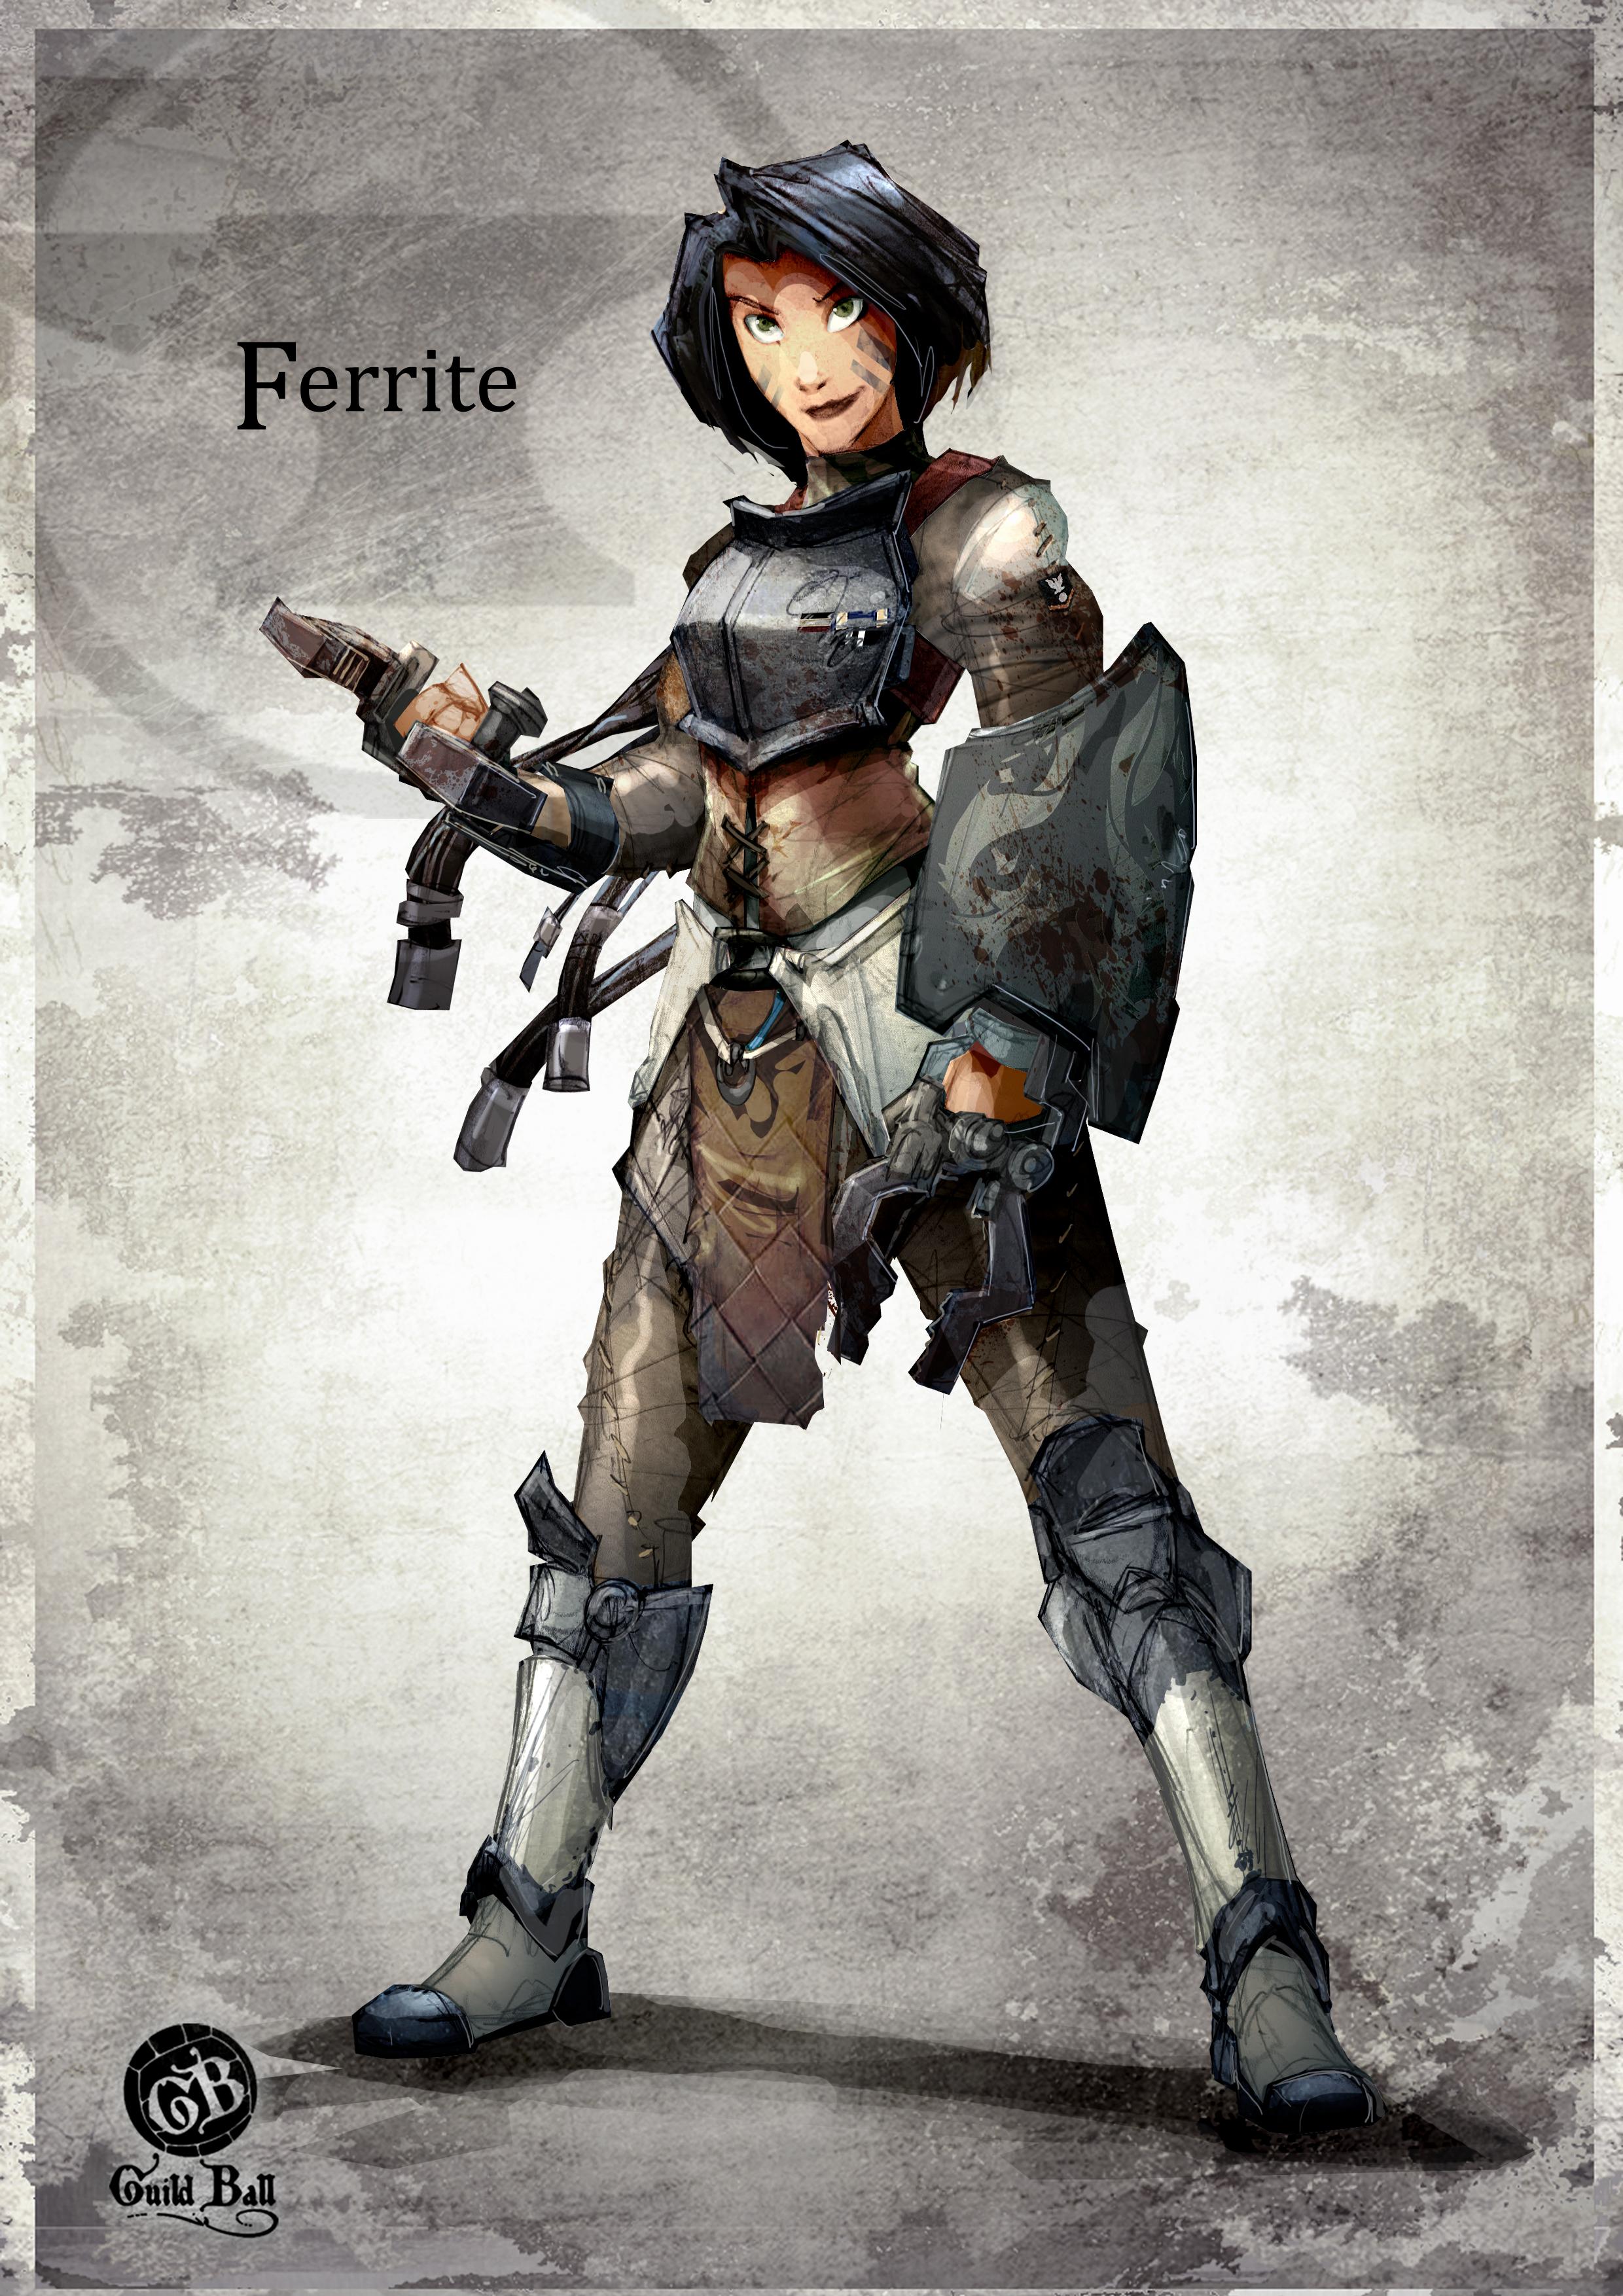 ferrite_01.jpg